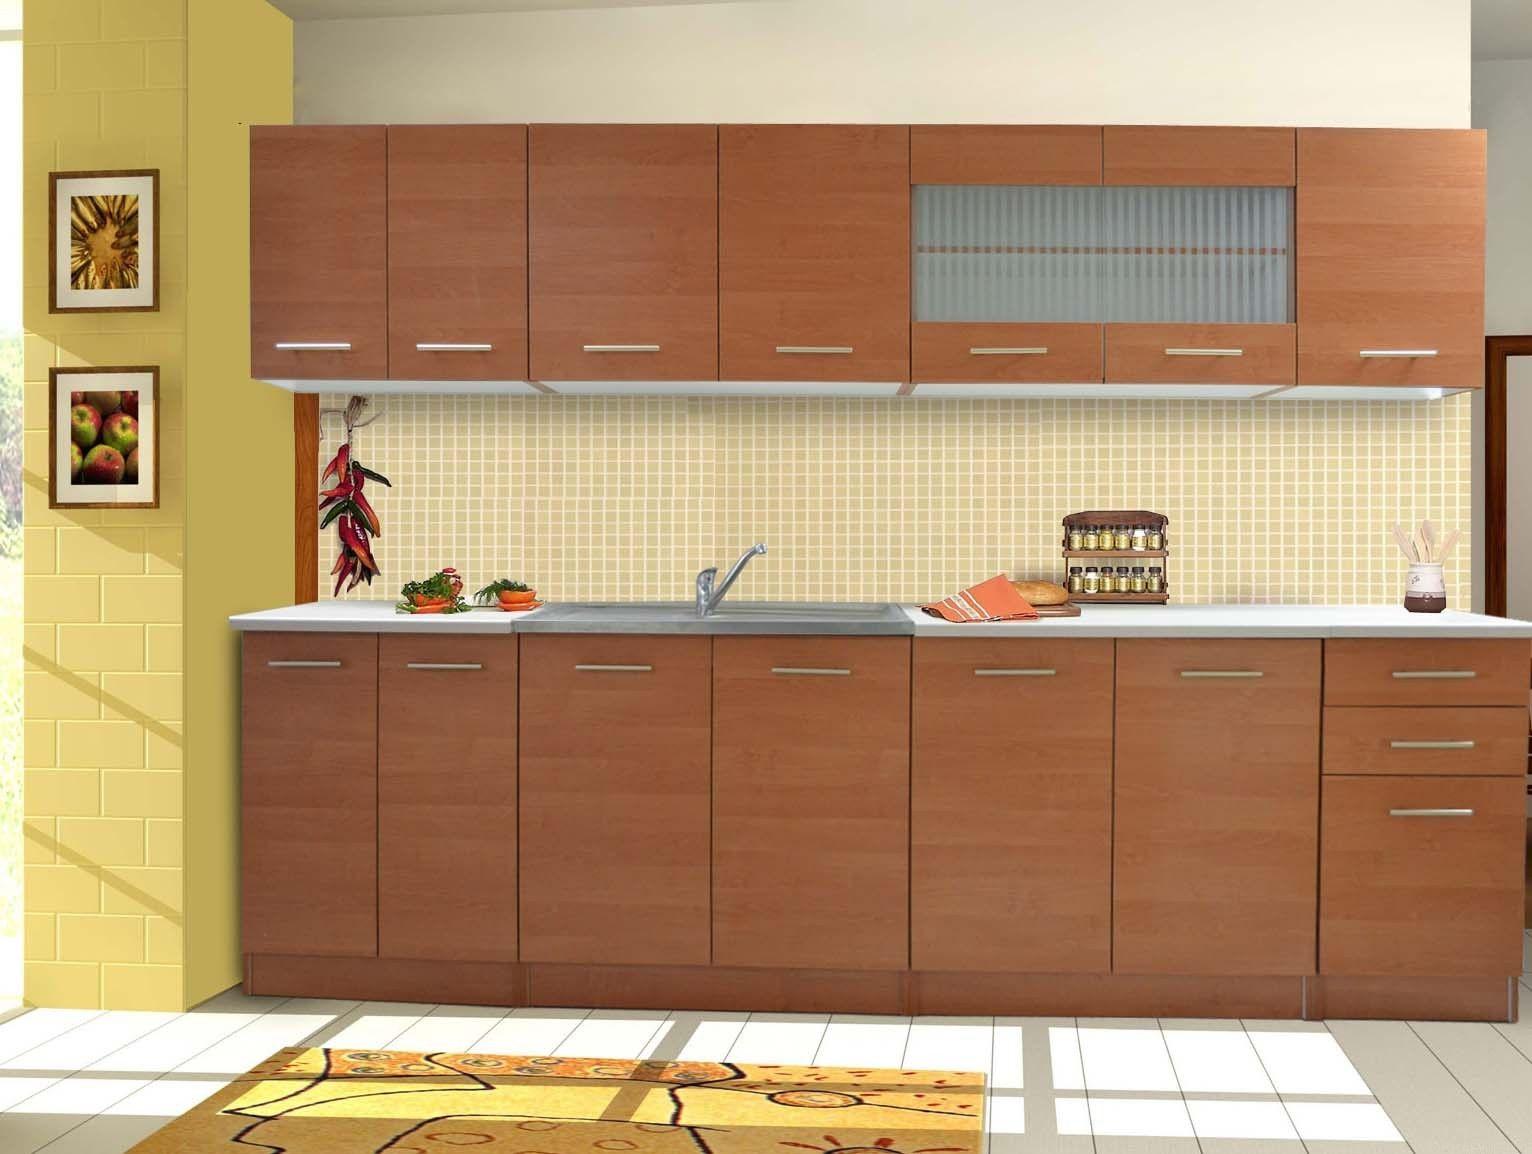 Zestaw Kuchenny Alan 2 6m Olcha Kitchen Cabinets Home Decor Kitchen